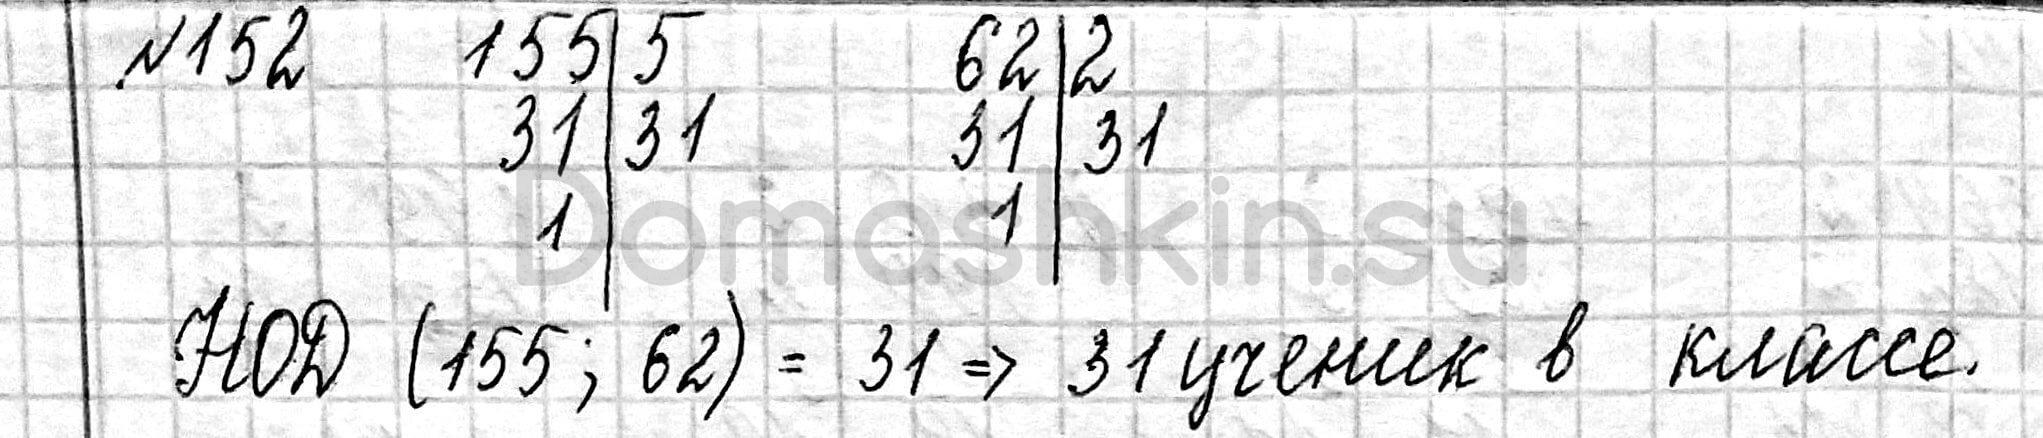 Математика 6 класс учебник Мерзляк номер 152 решение